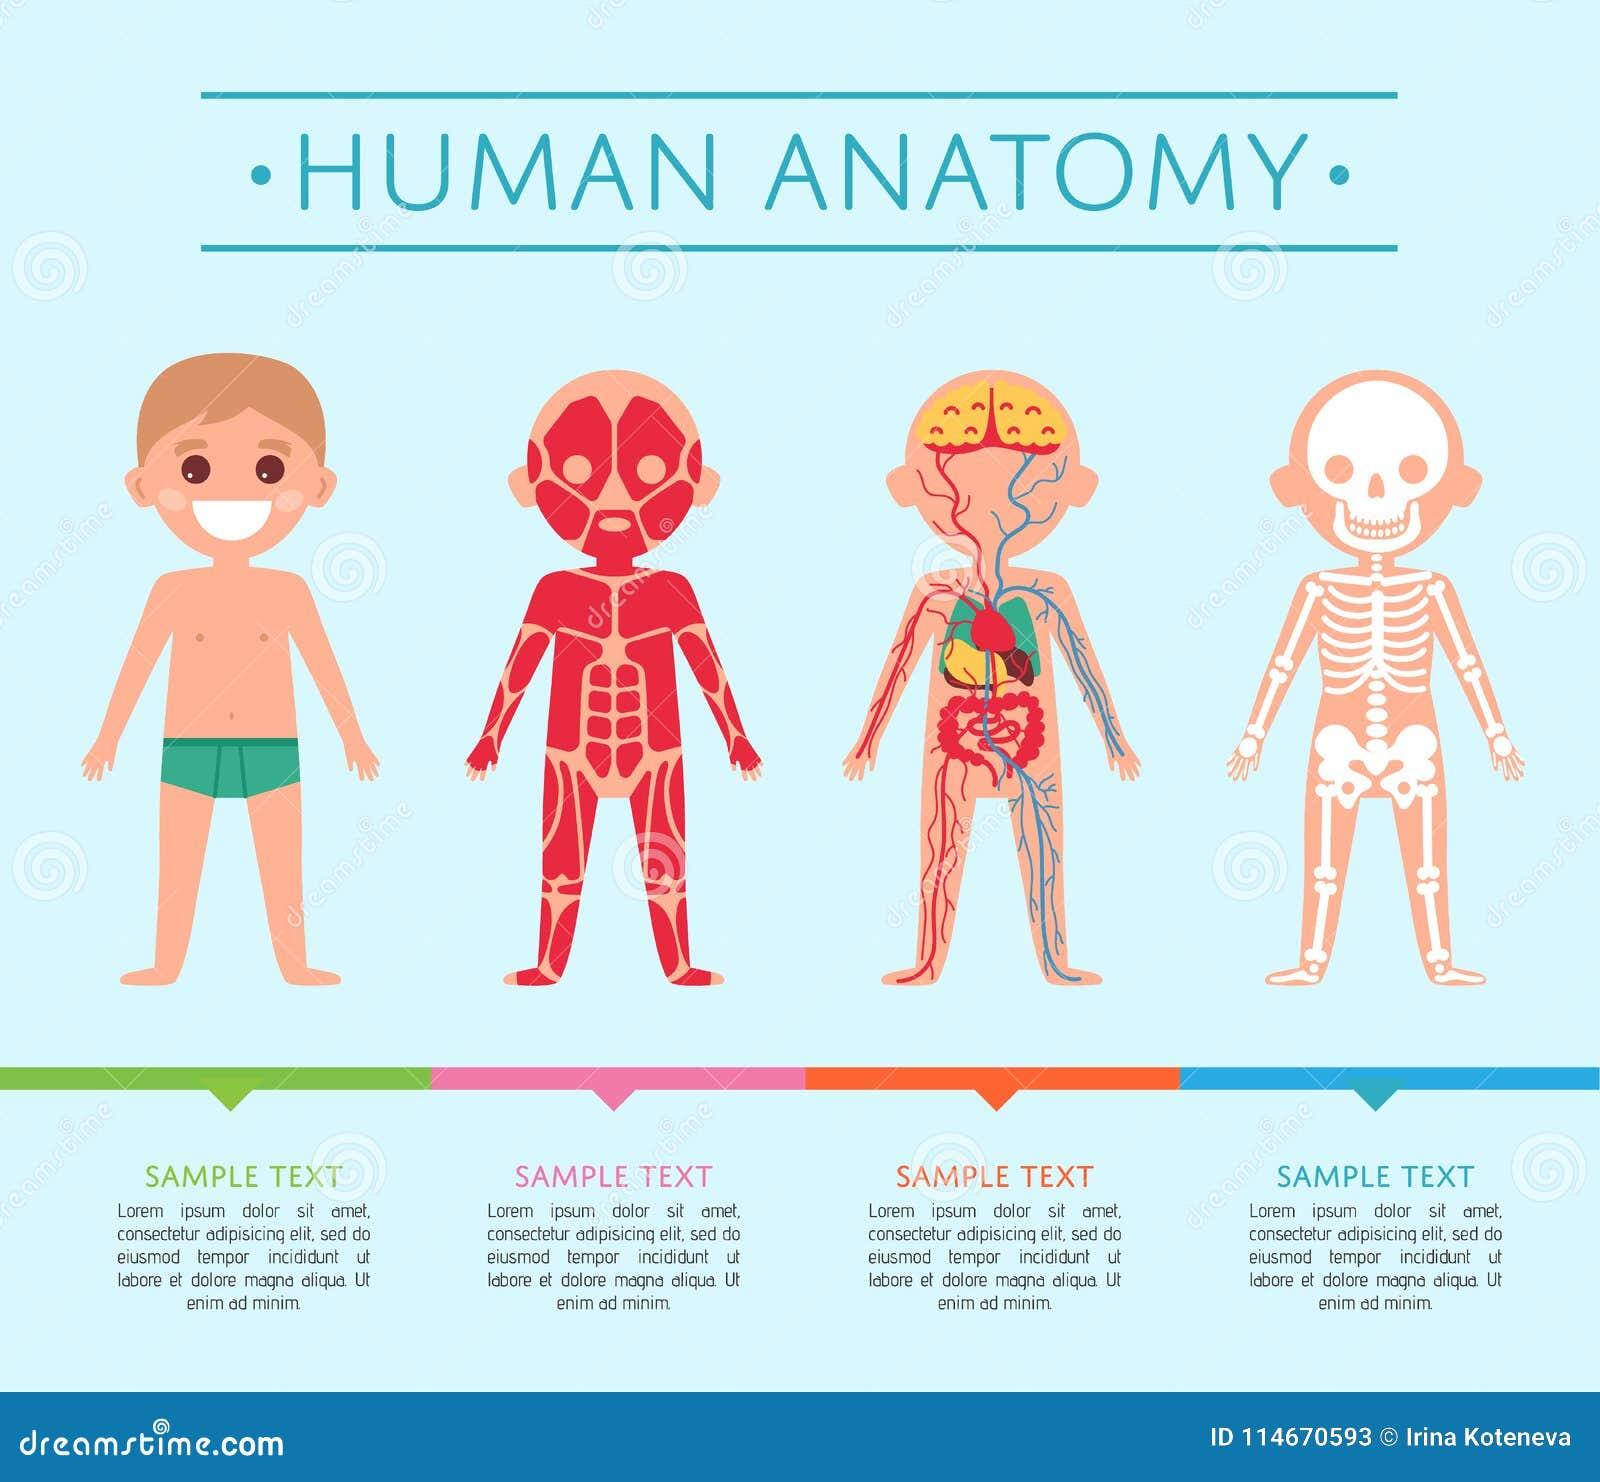 Human Anatomy Poster With Child Stock Illustration - Illustration of ...